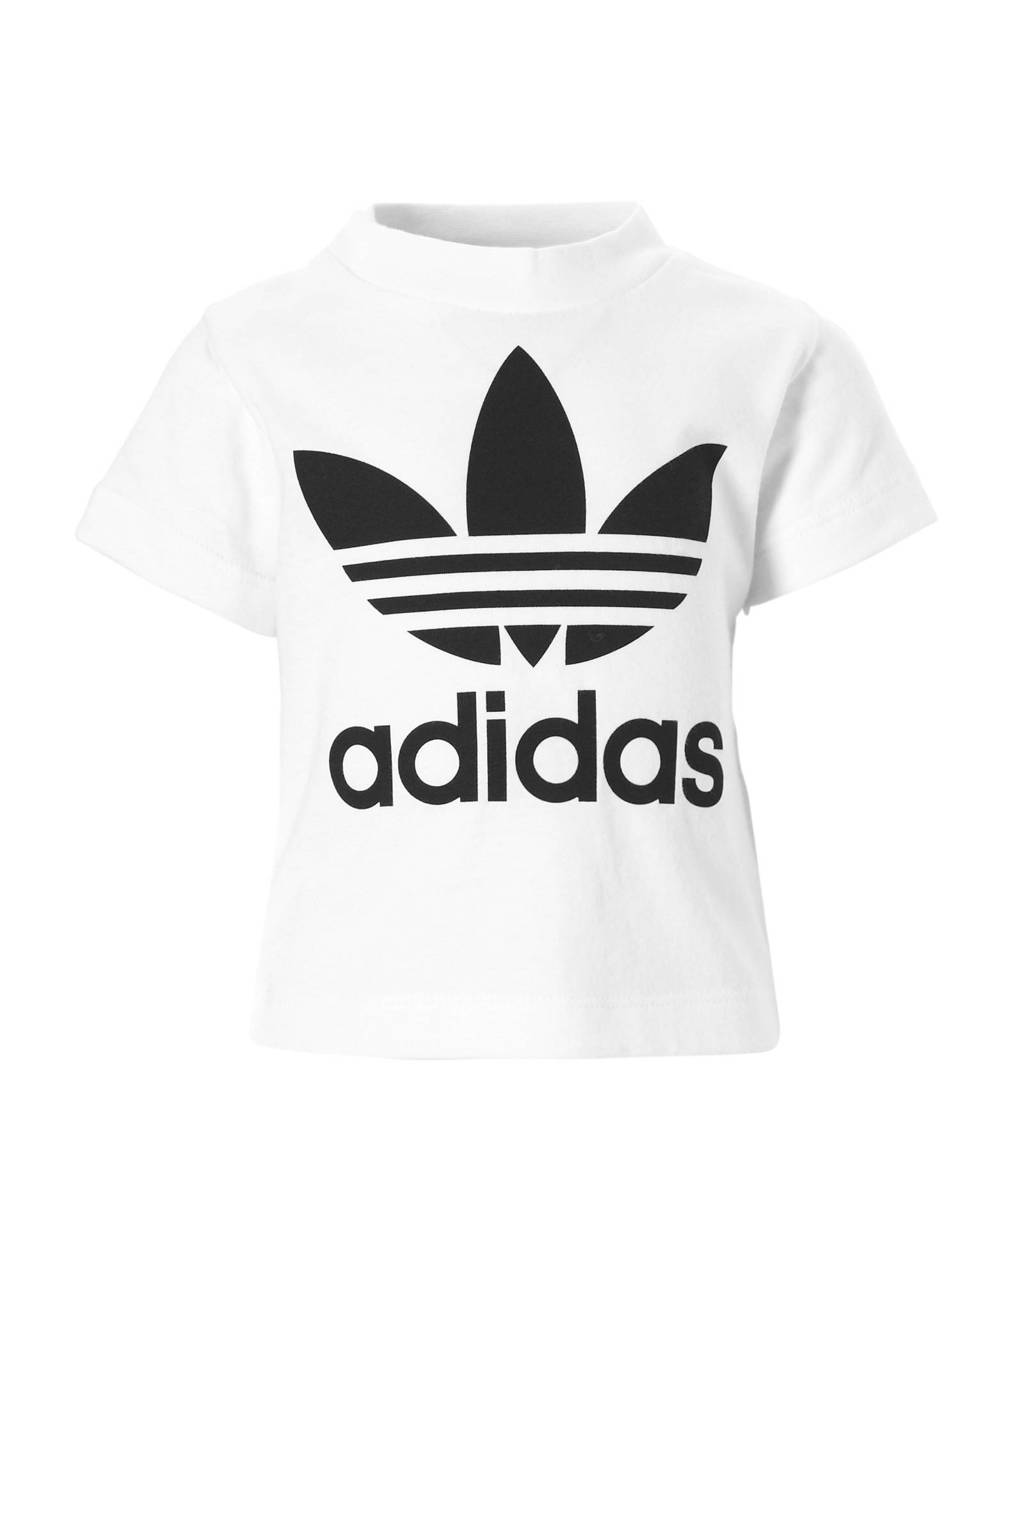 adidas Originals Adicolor T-shirt wit/zwart, Wit/zwart